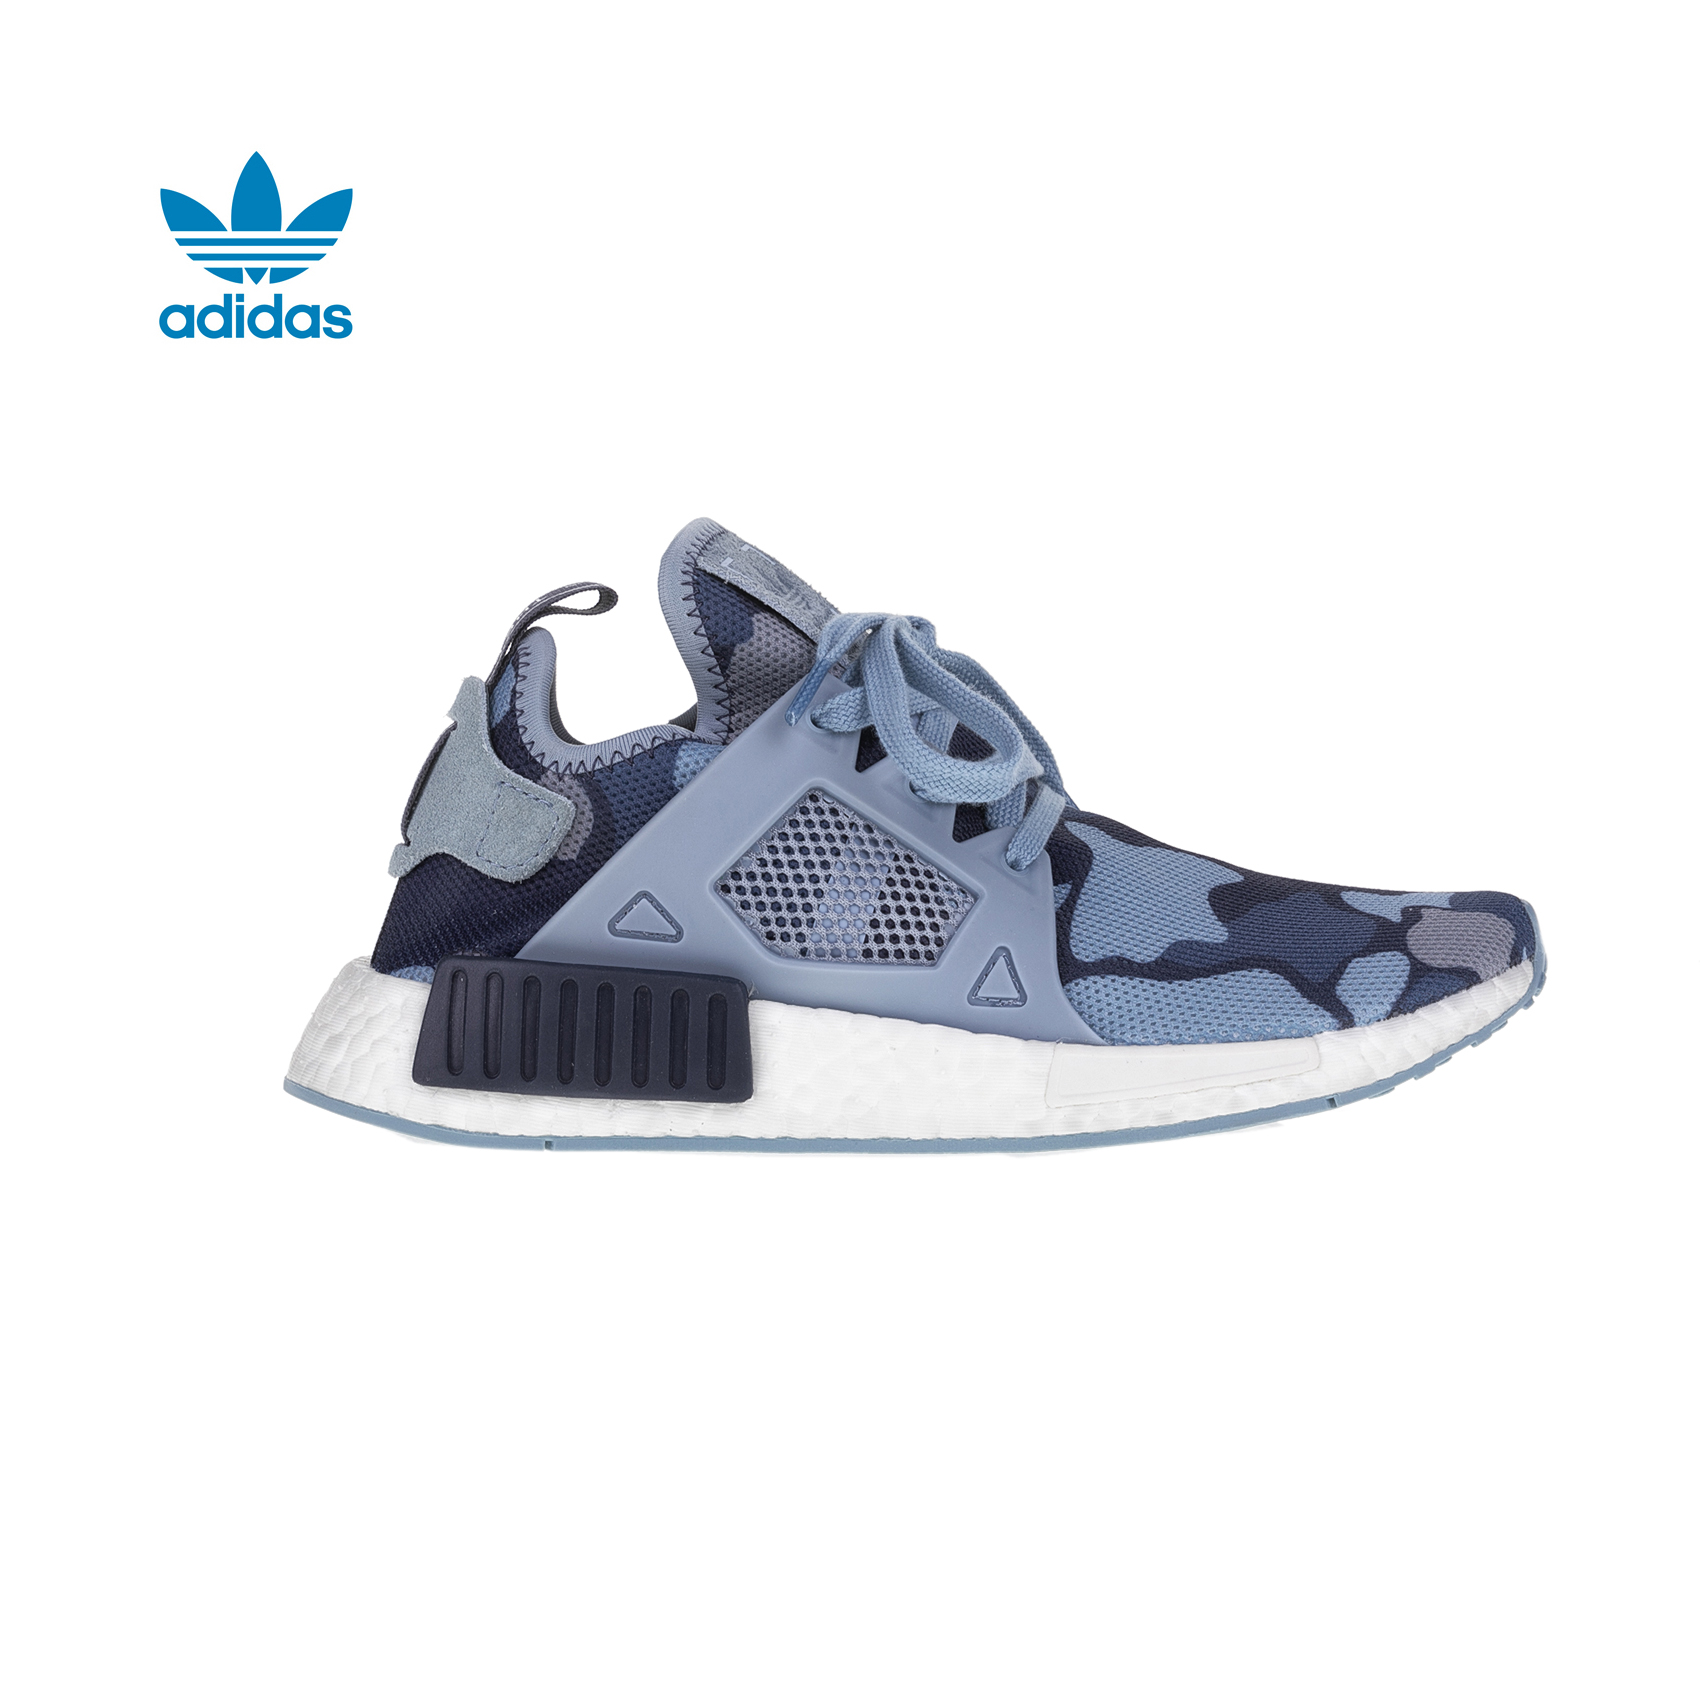 adidas Originals - Γυναικεία παπούτσια adidas NMD_XR1 μπλε γυναικεία παπούτσια αθλητικά running